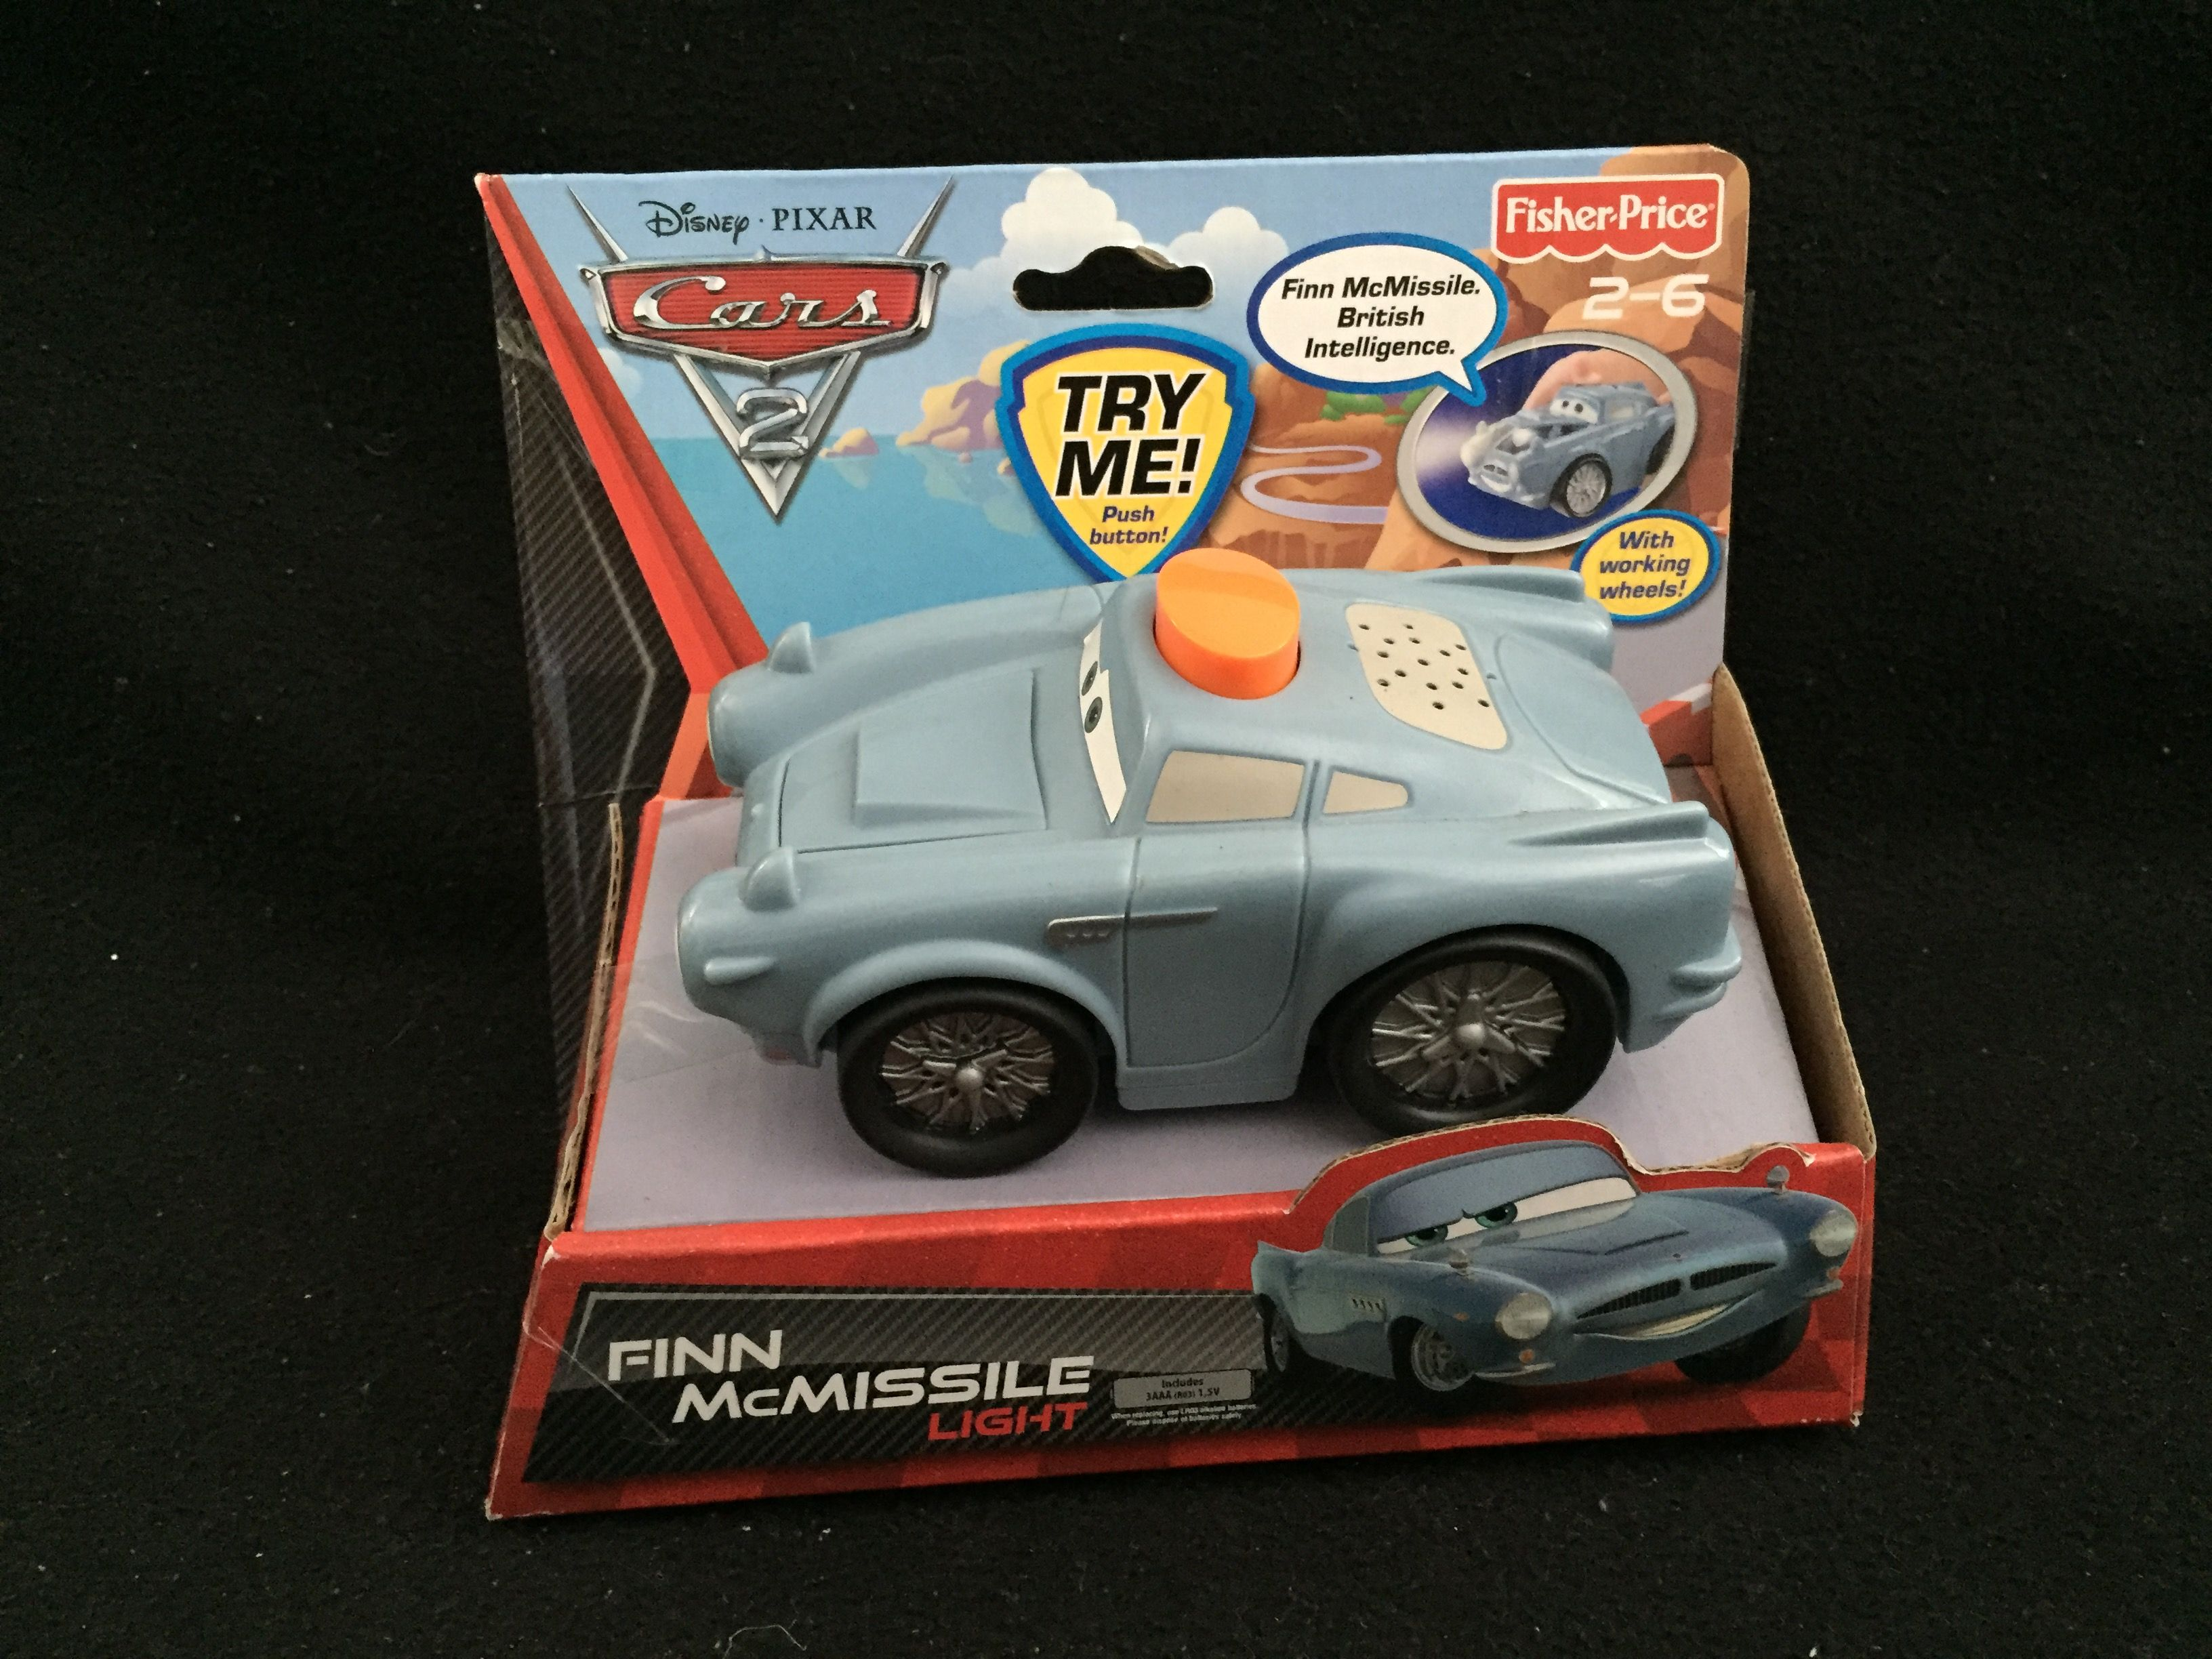 Fisher Price Disney Pixar Cars 2 Light Up Vehicle Disney Pixar